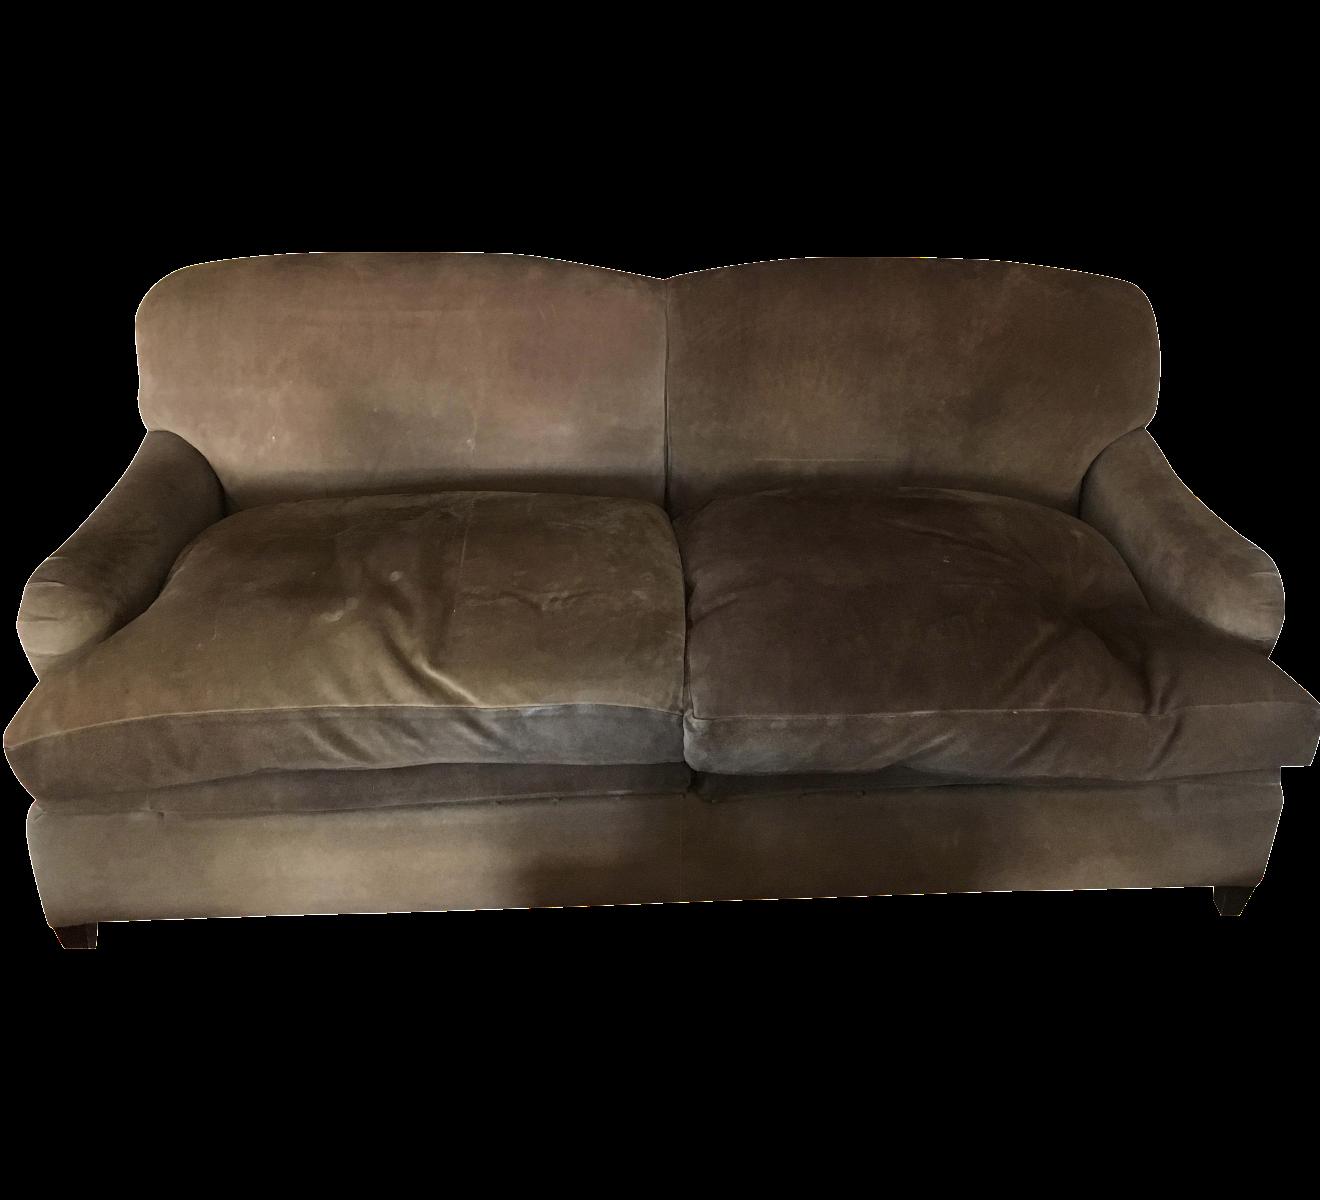 George Smith Suede Sleeper Sofa Chairish